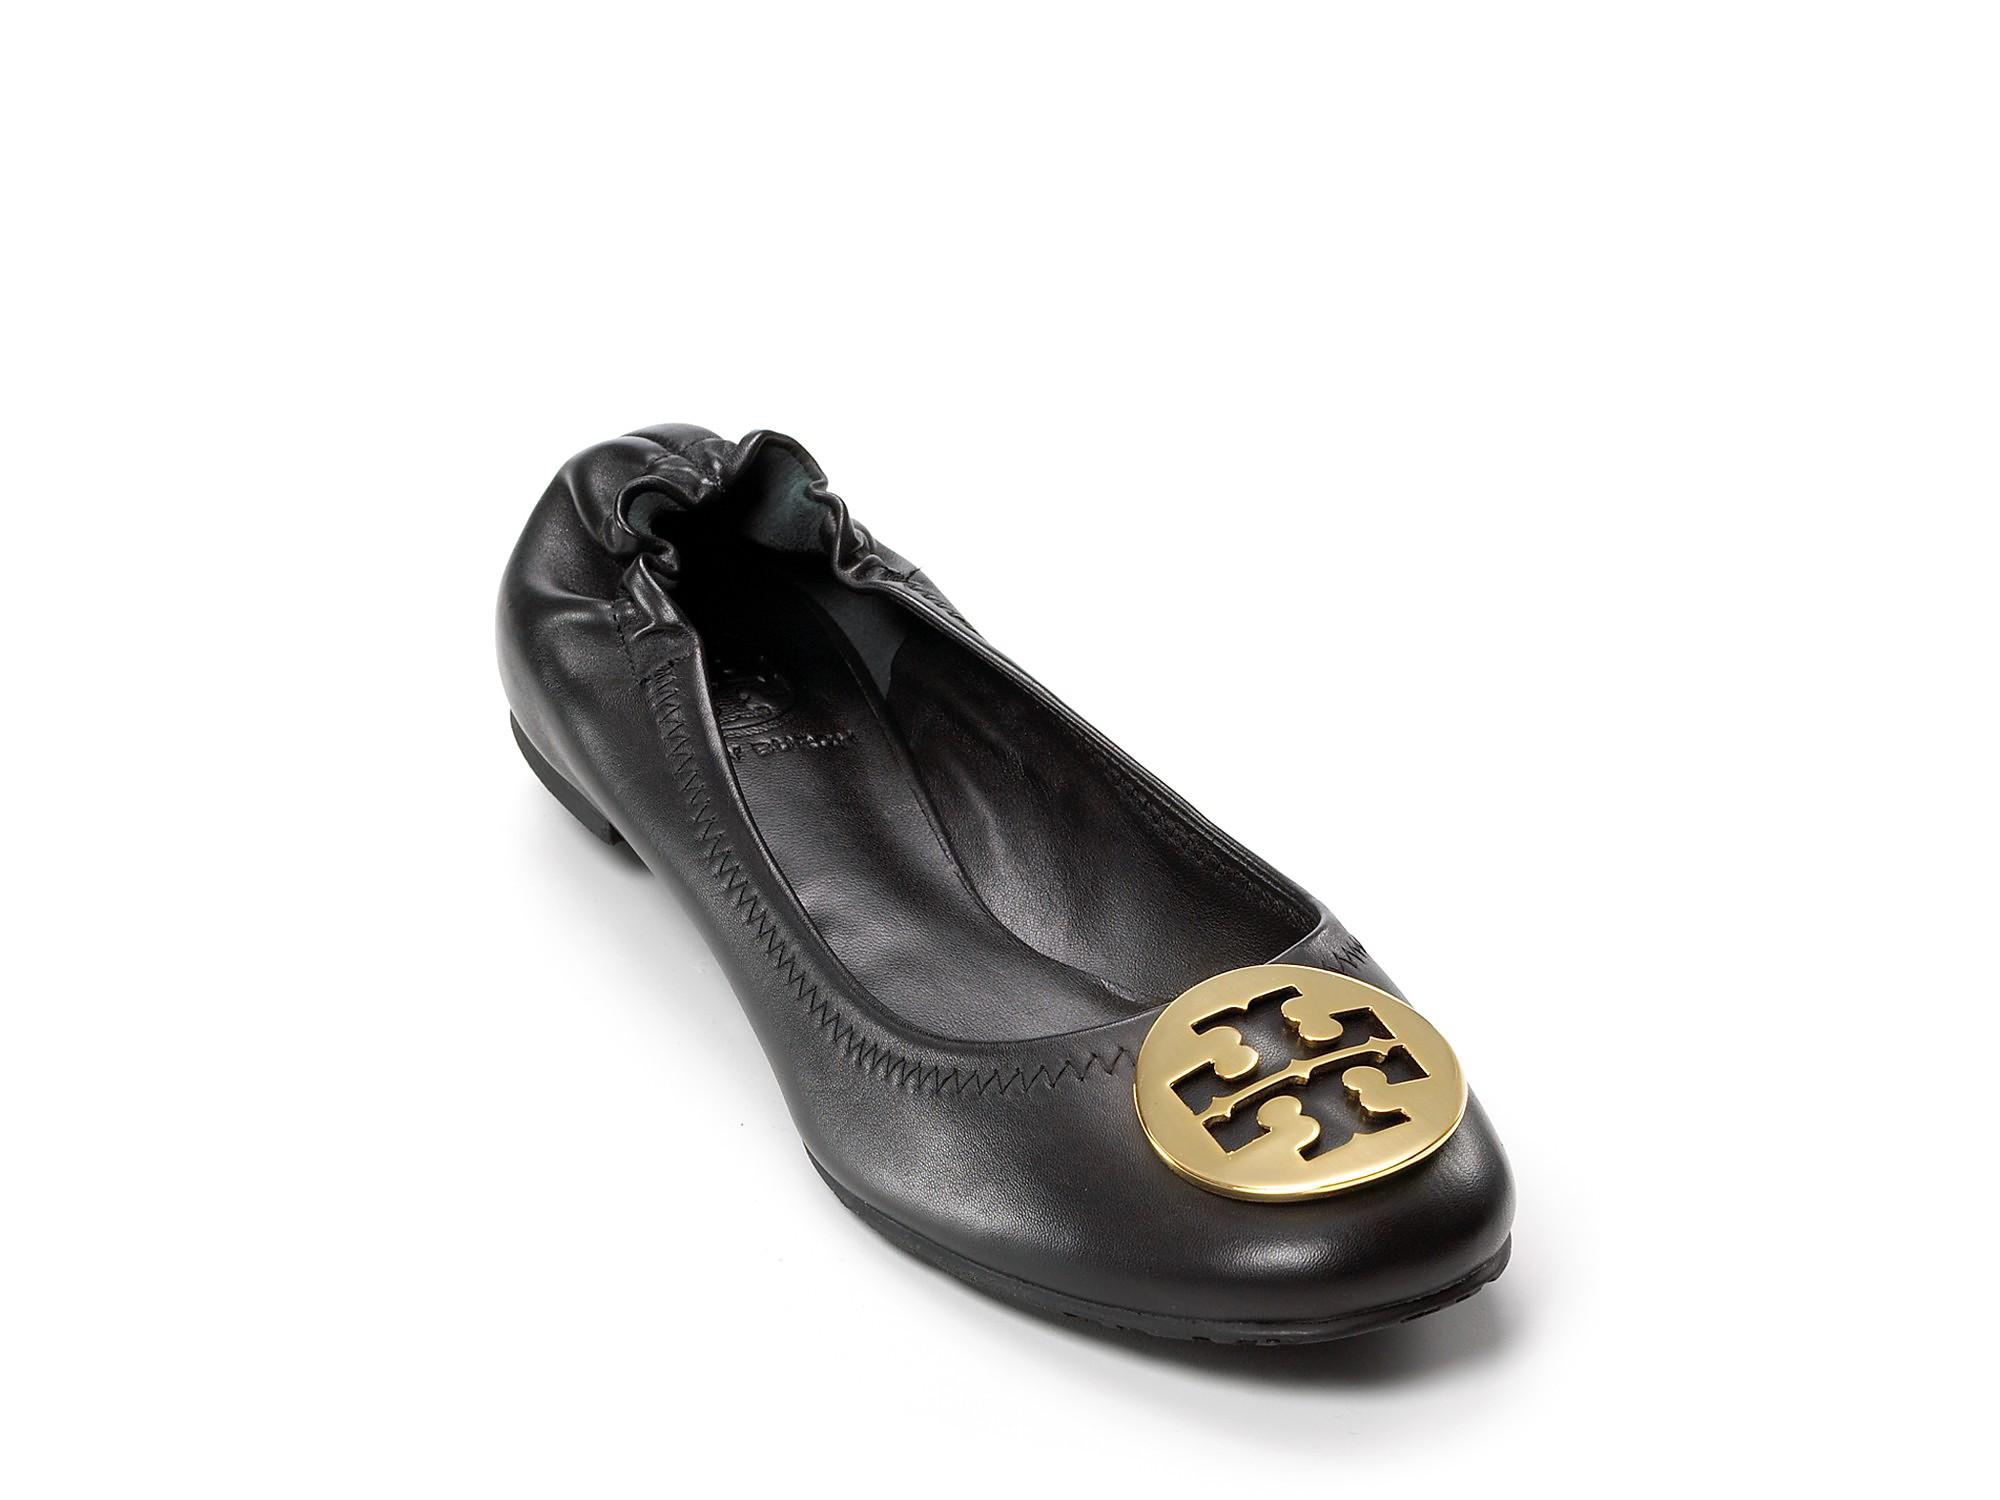 fb4bec3e5d45dd Lyst - Tory Burch Flats Reva Ballet in Black